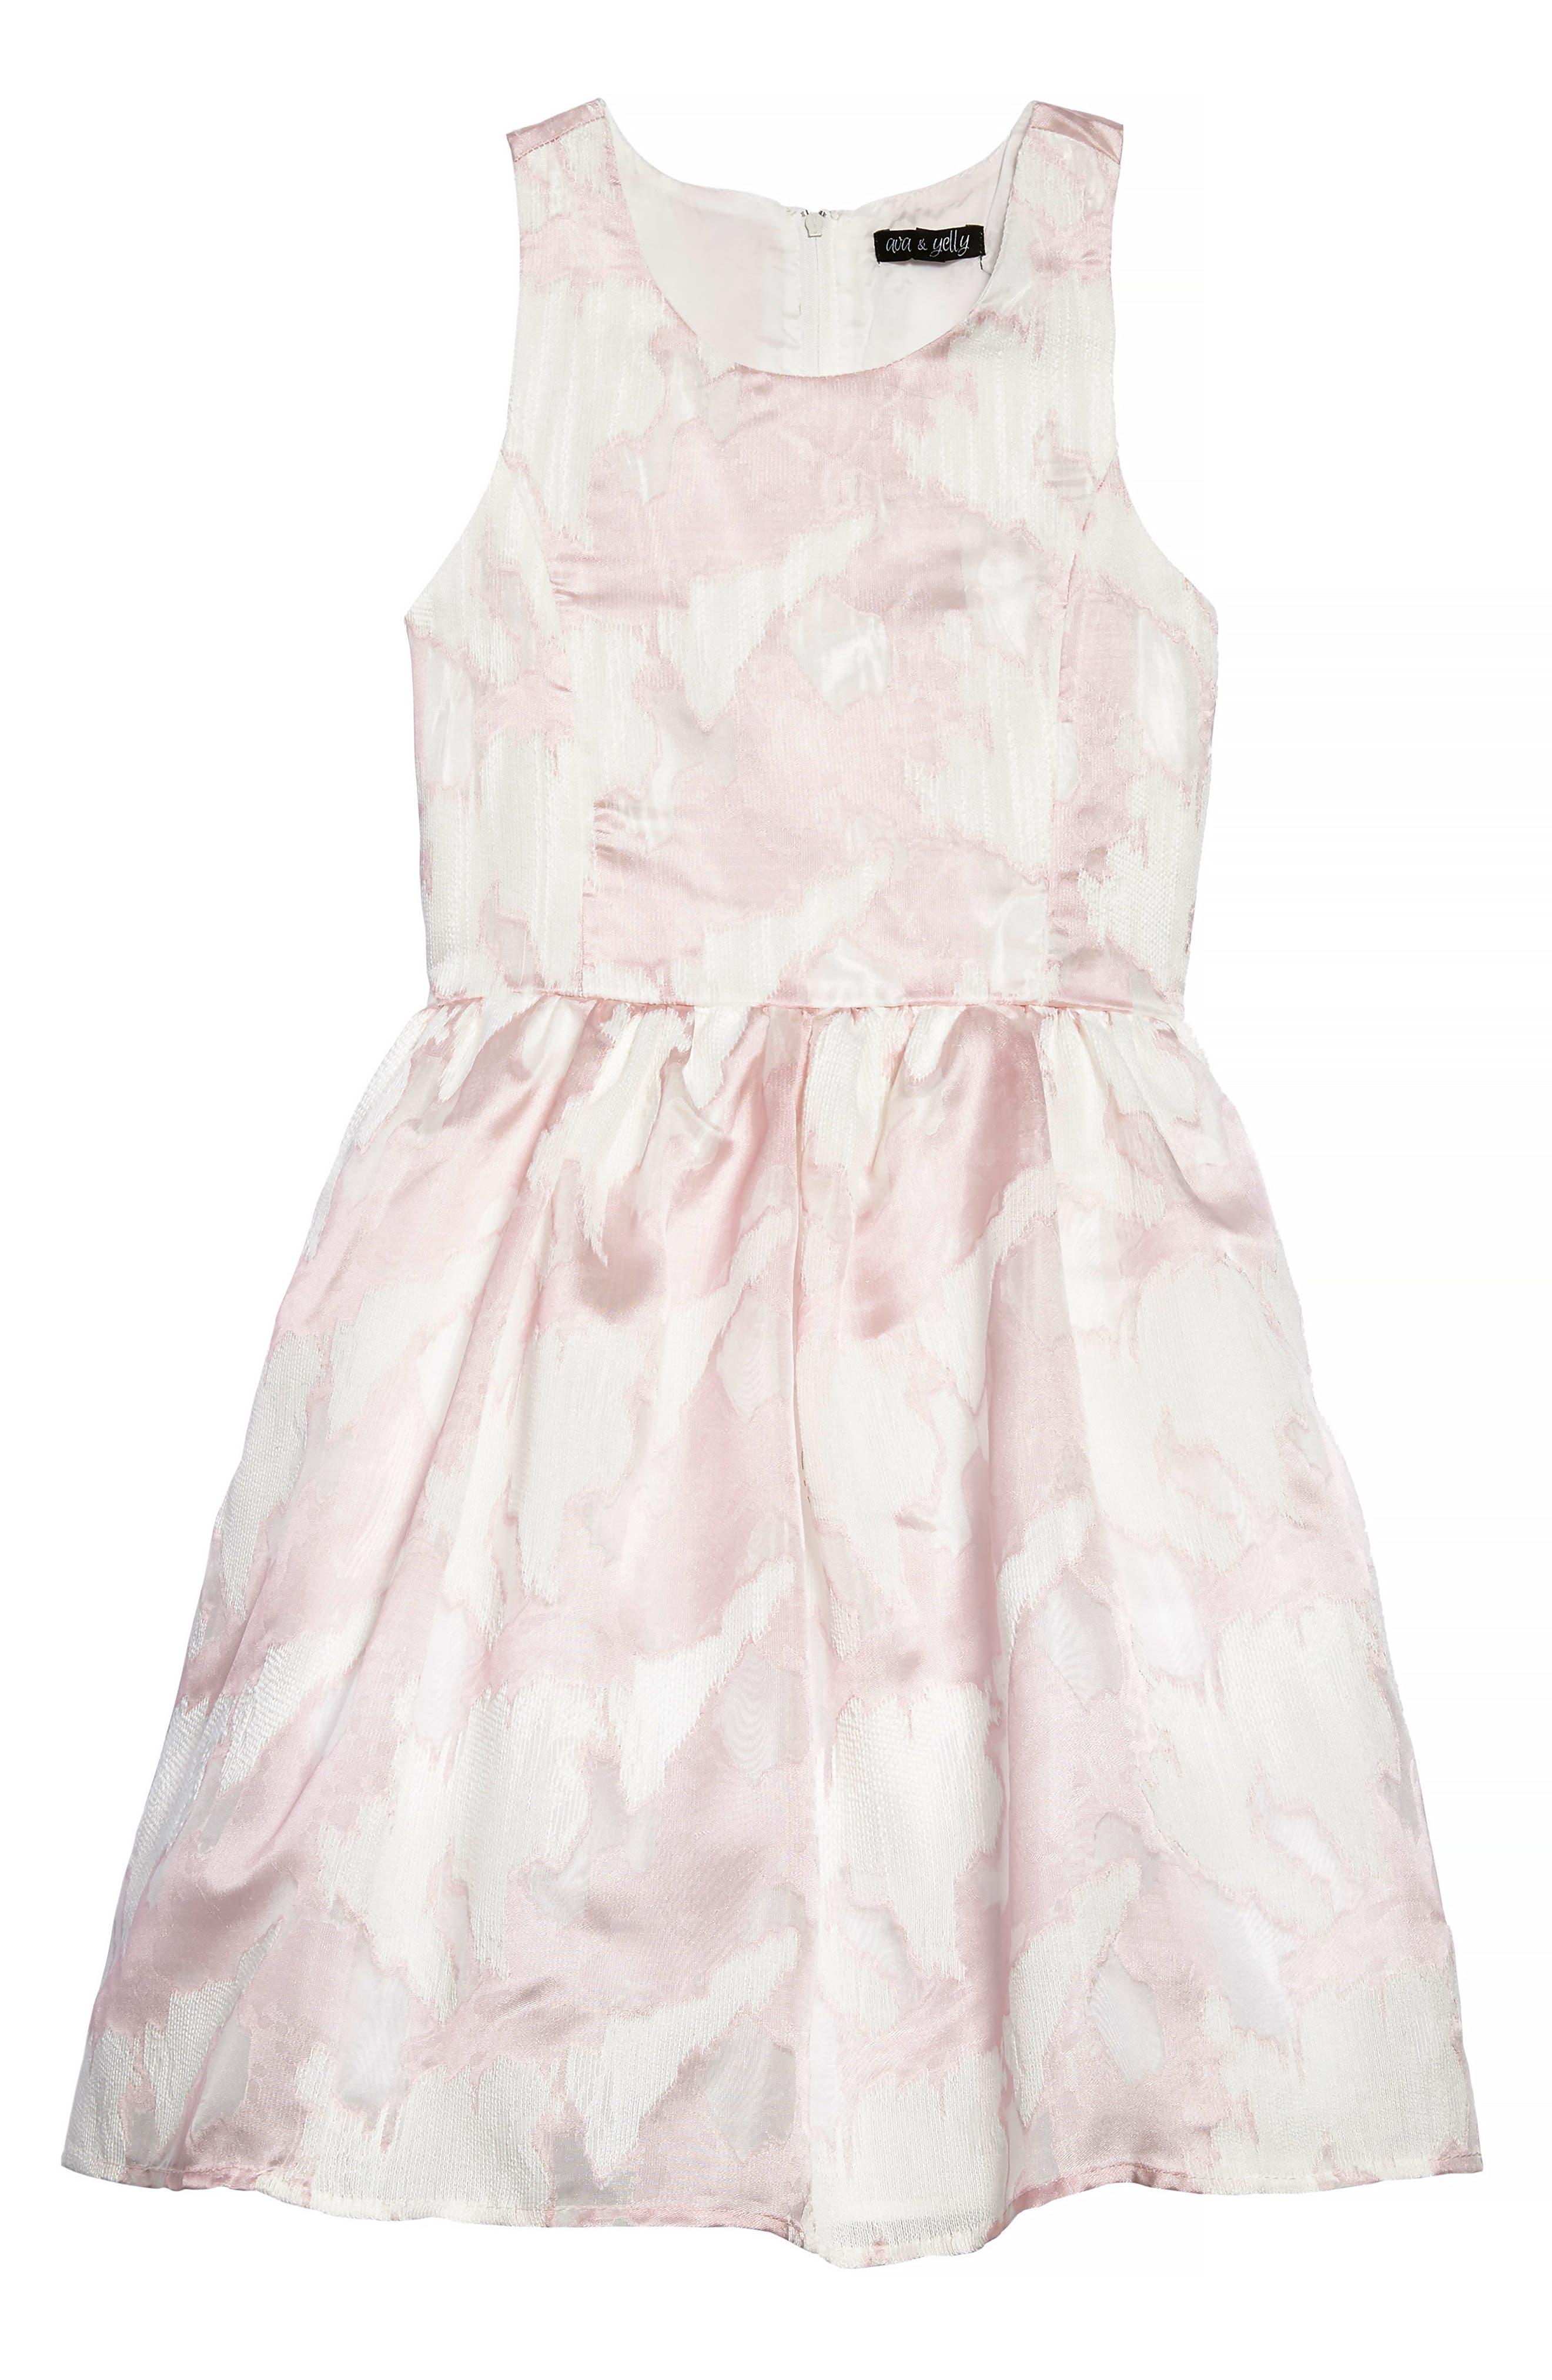 Chiffon Party Dress,                         Main,                         color, Pink/ White